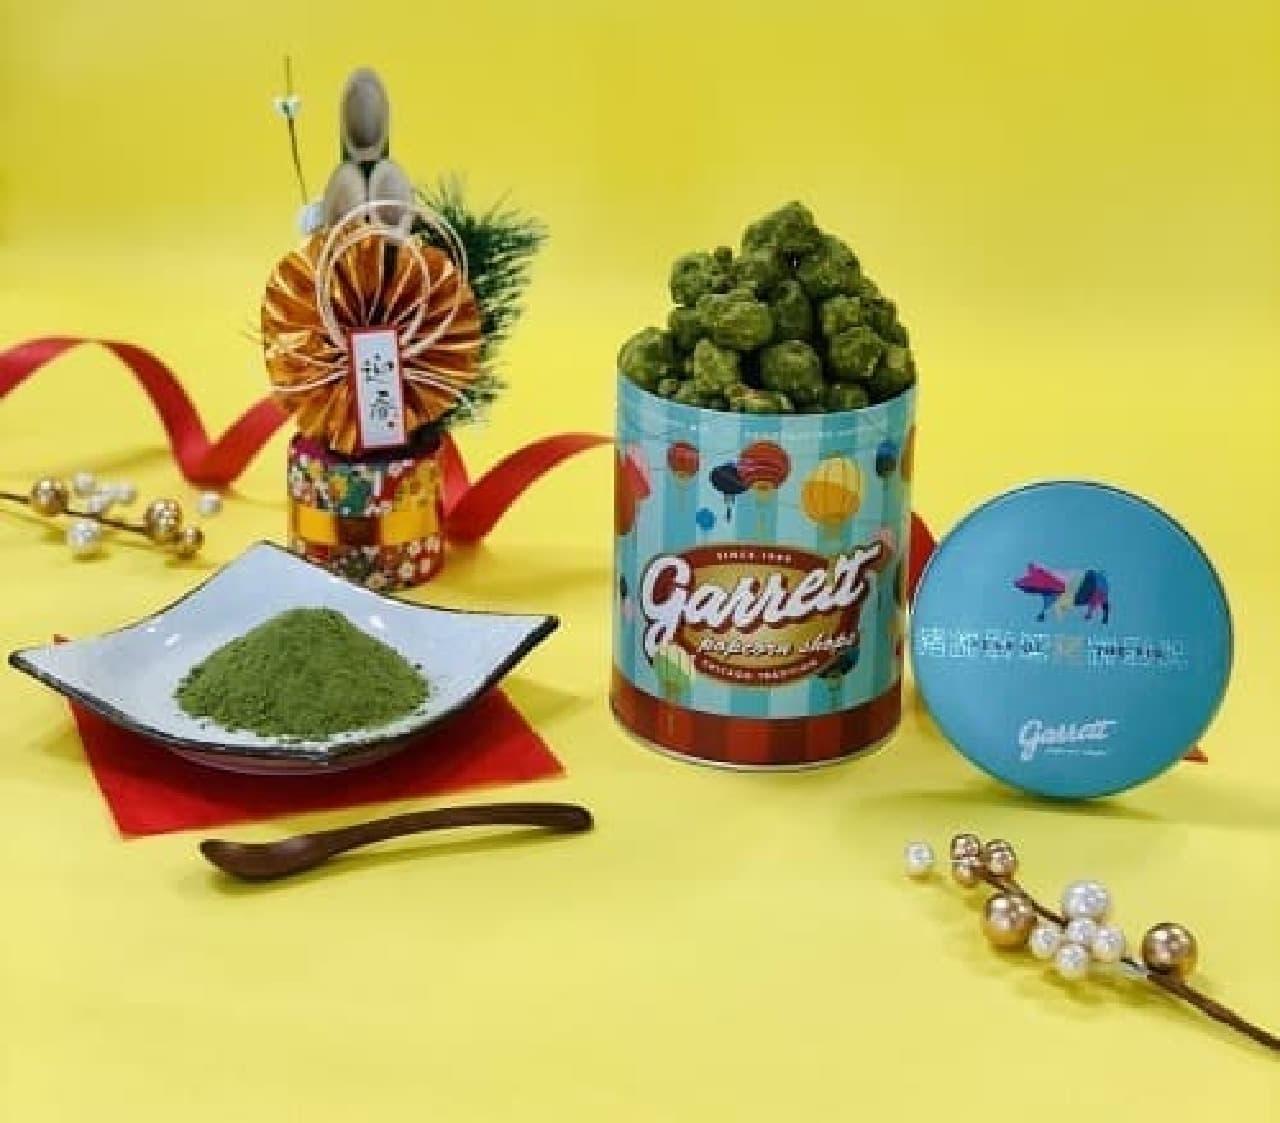 「Garrett 2019 ETO缶」と日本限定の新フレーバー「抹茶トリュフ キャラメルクリスプ」